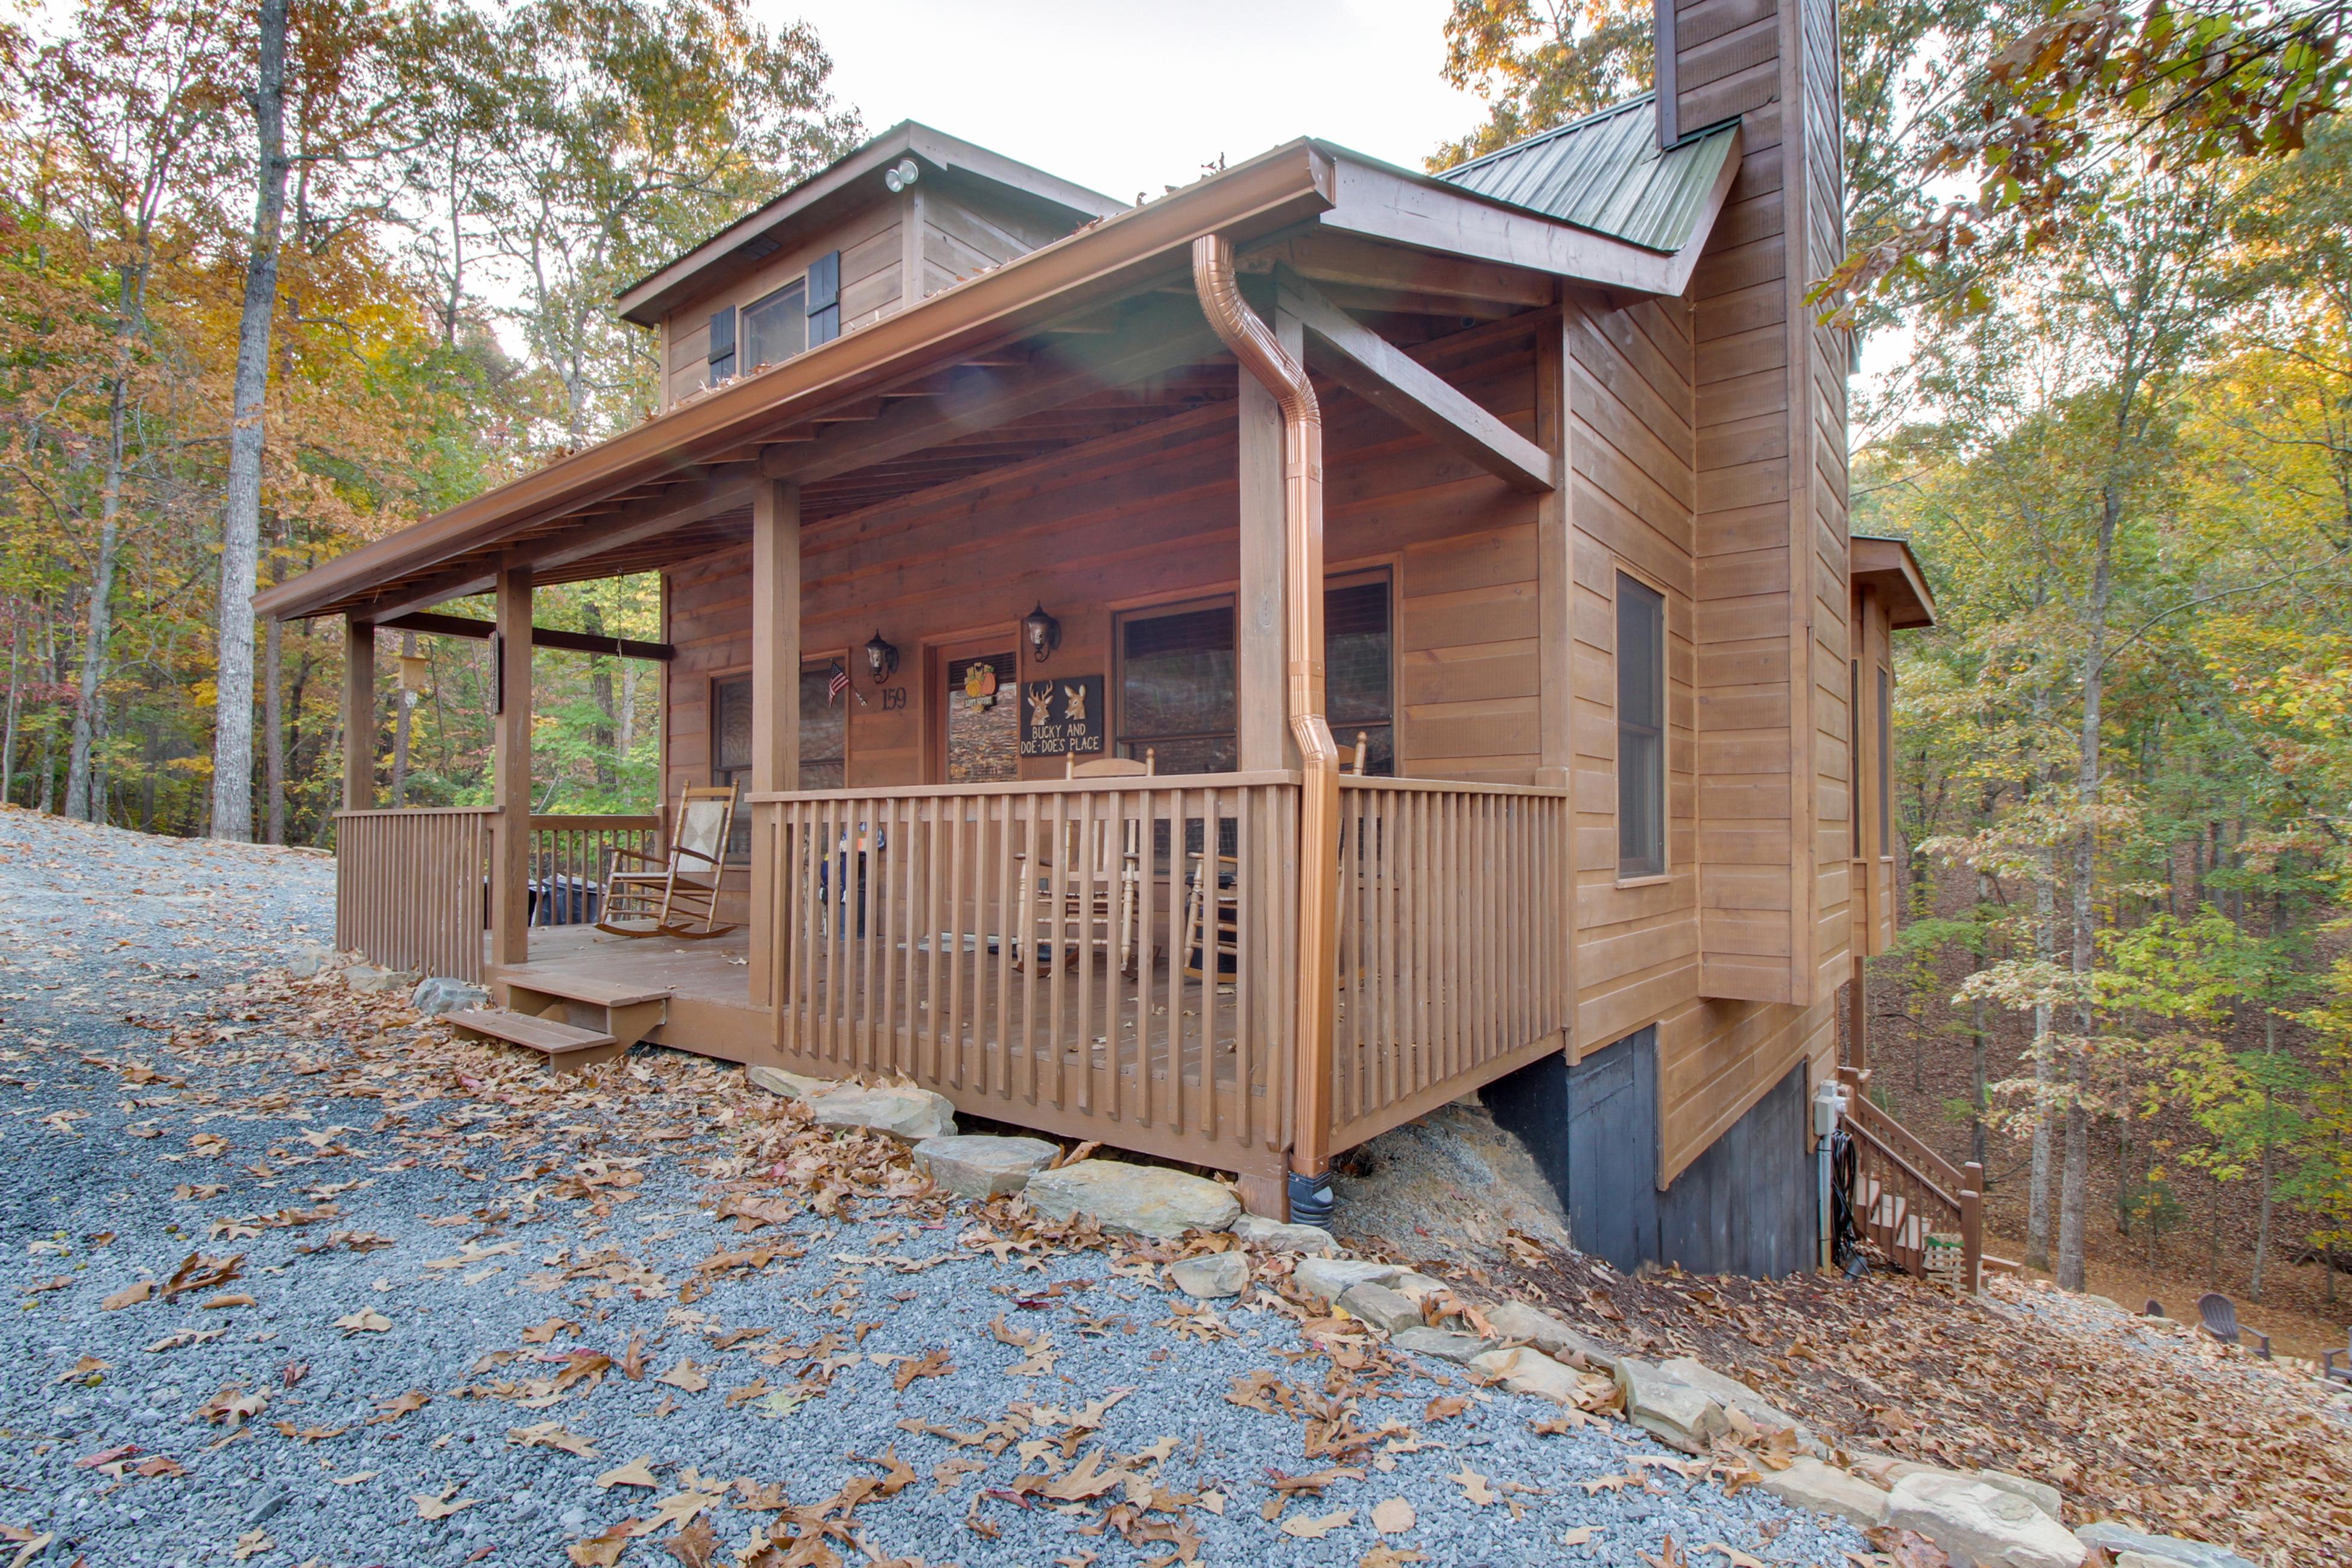 cherry log listings ga konkel nut michael cabins hickory ellijay trail in